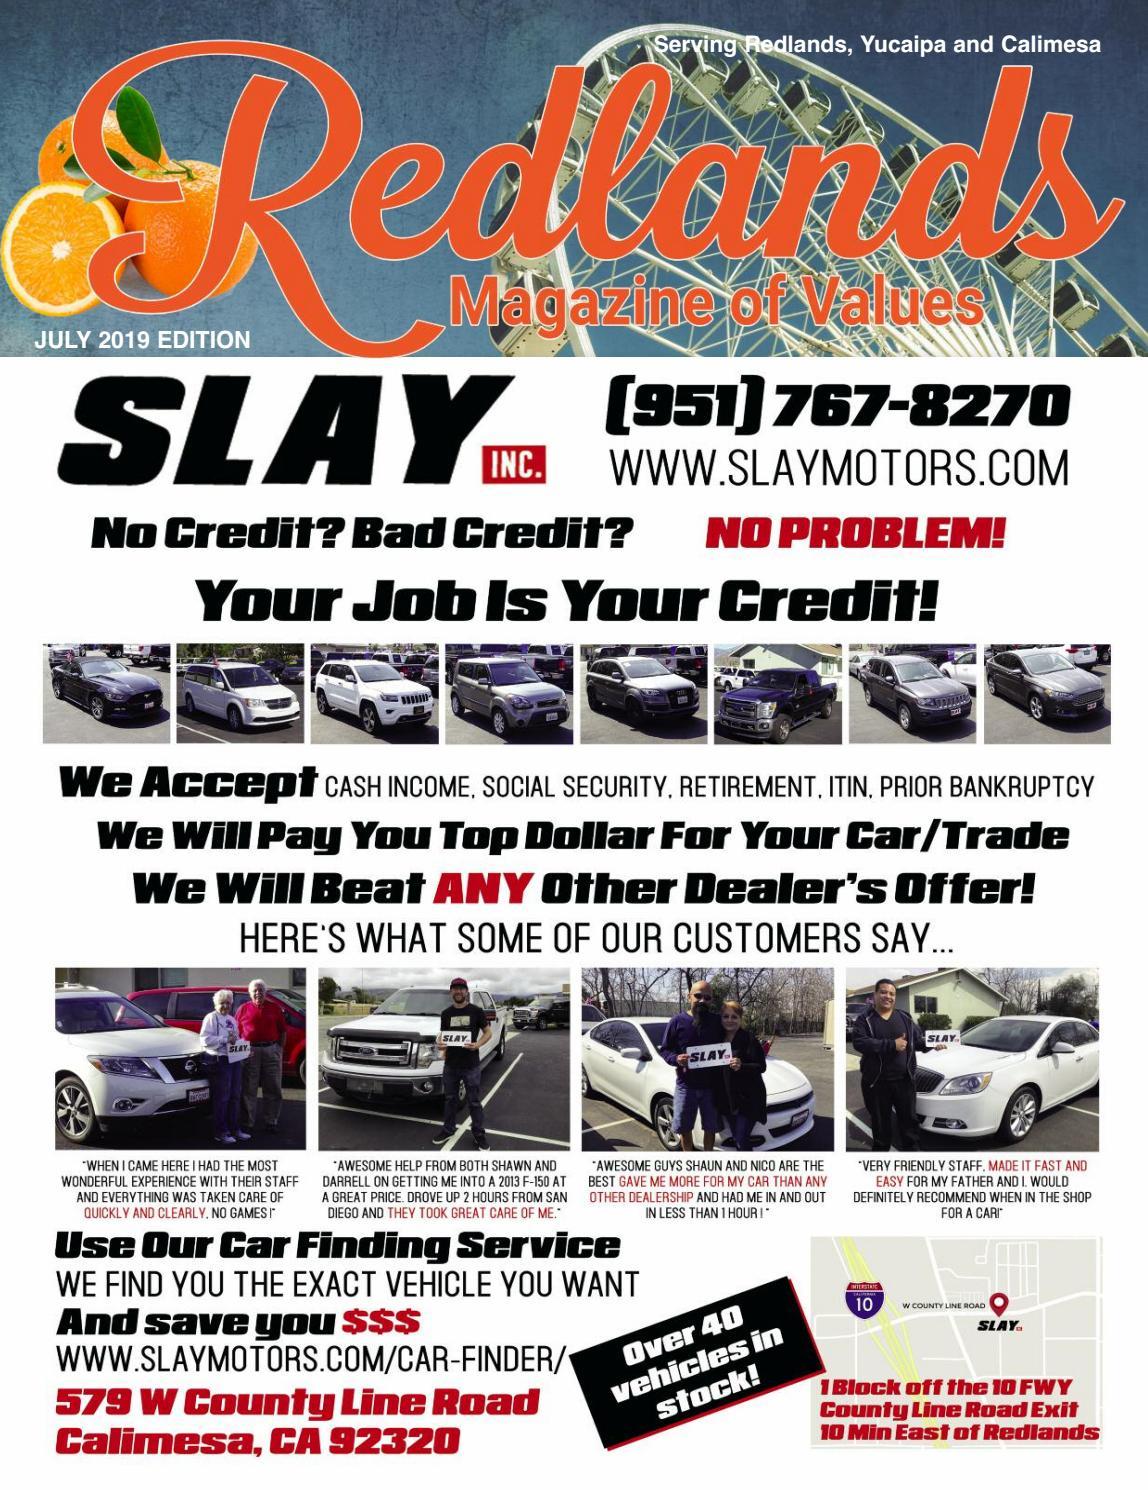 yucaipa coupon magazine